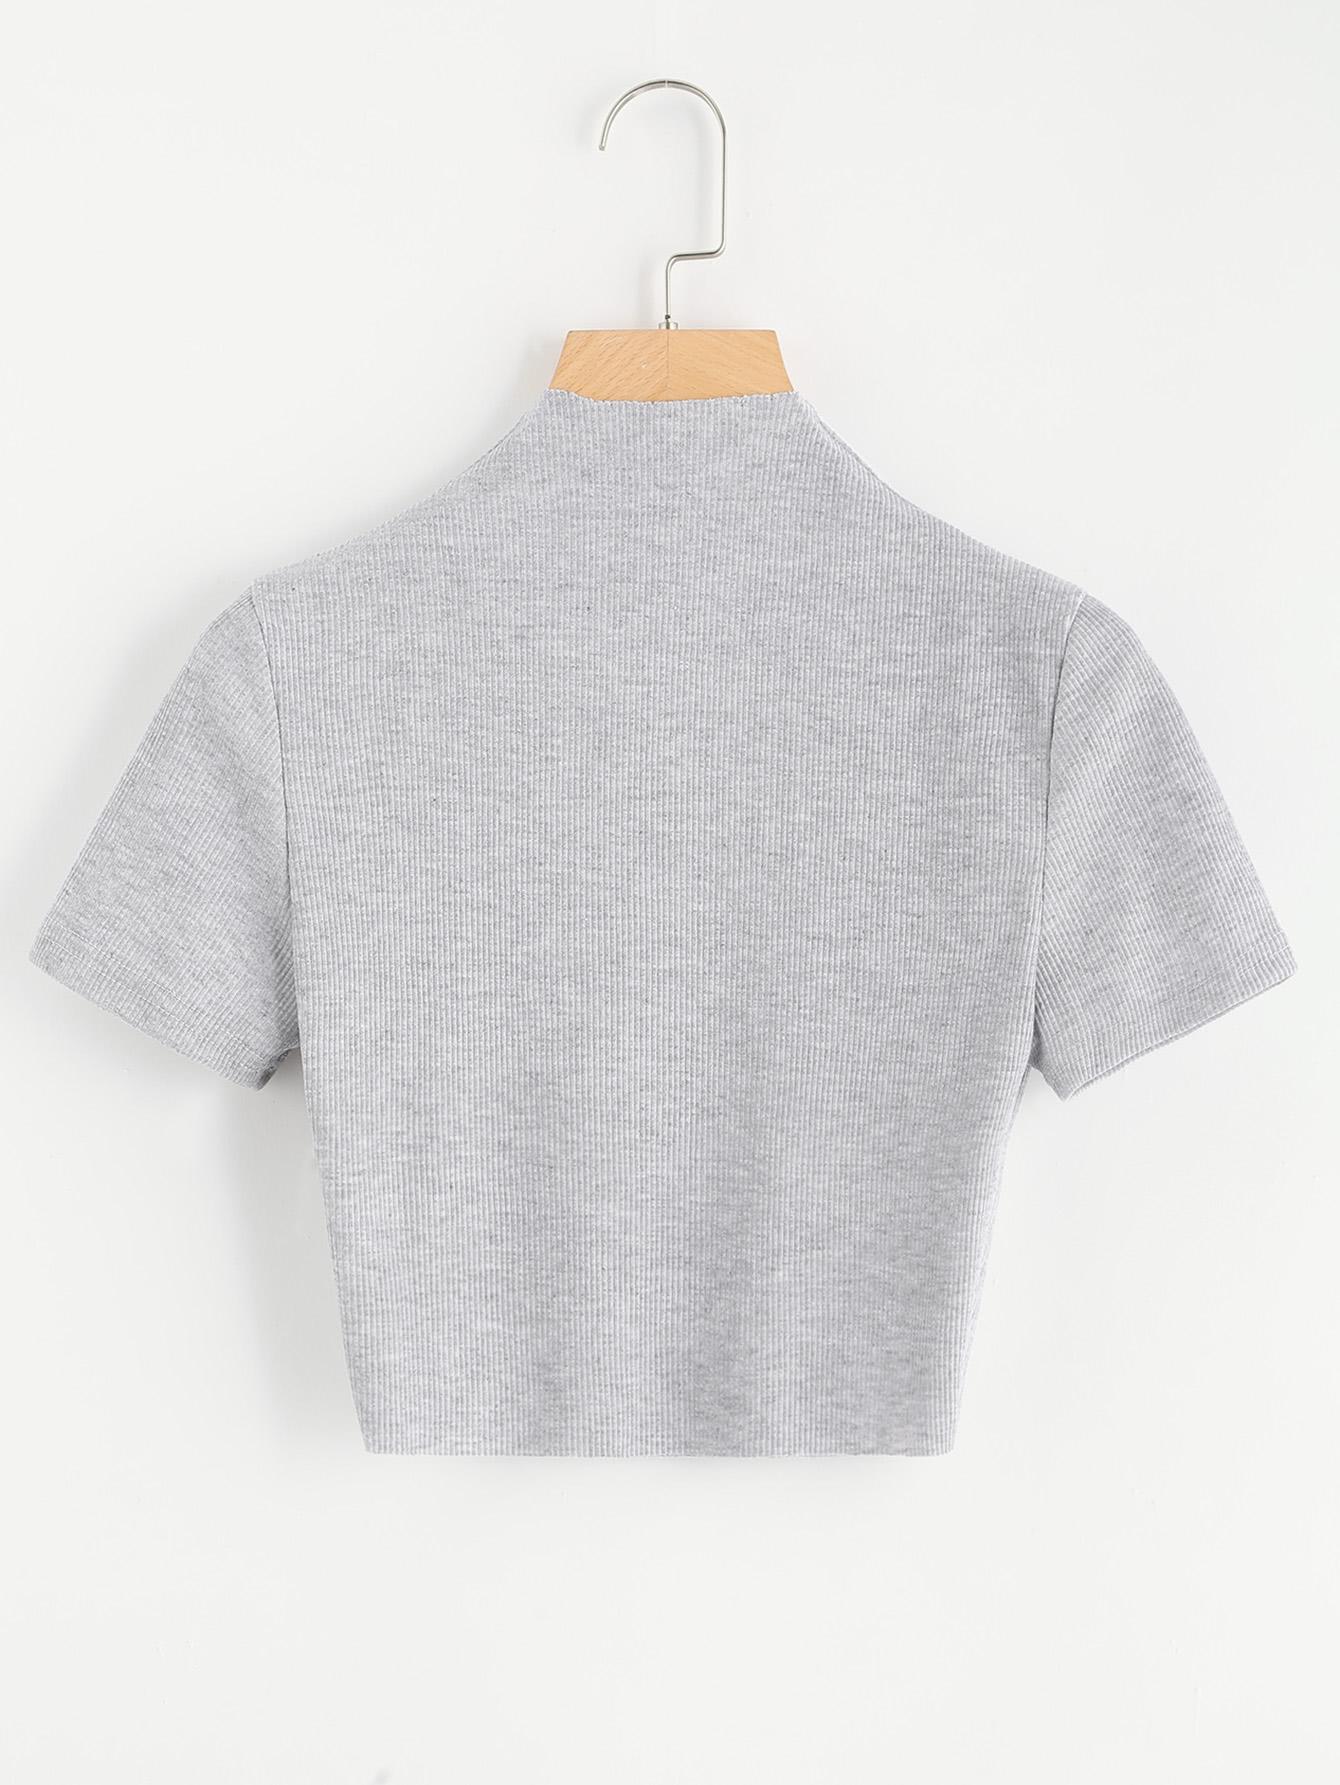 Купить Ребристая кроп футболка с высоким воротником, null, SheIn